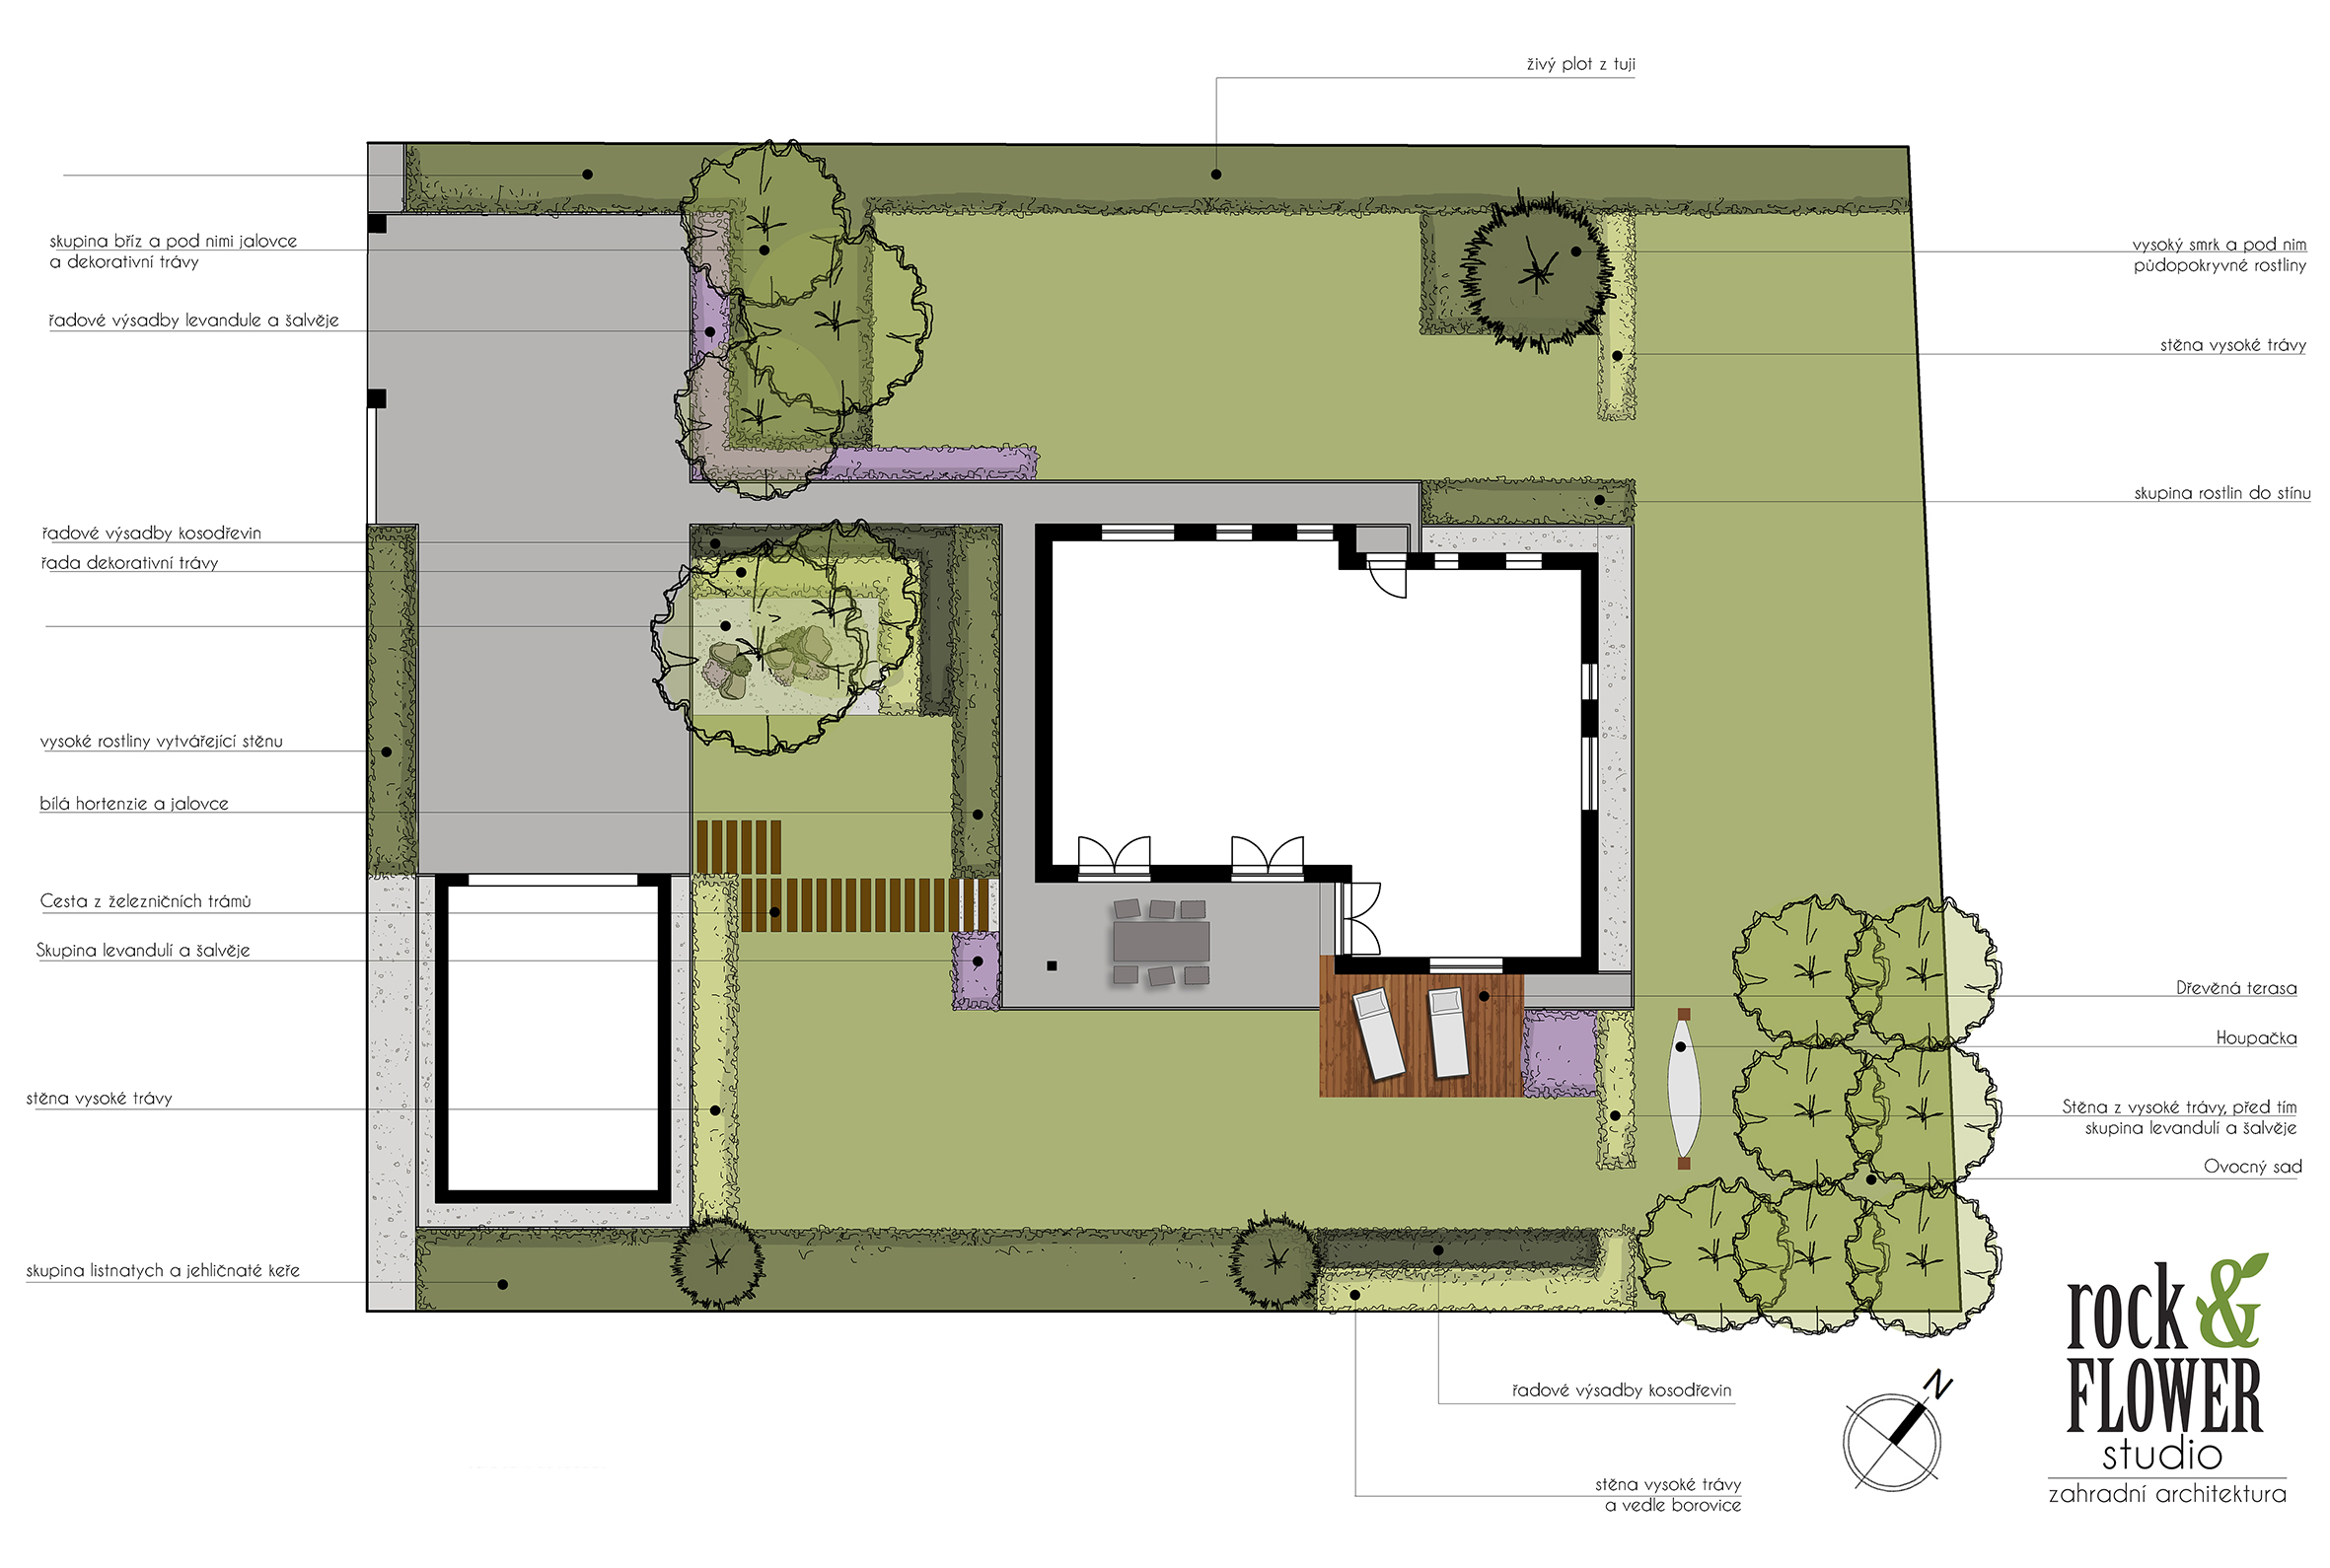 navhr-zahrady-v-ostrave-projekt-zahrady-zahradniarchitekt-praha-rockandflowerstudio-zahrady